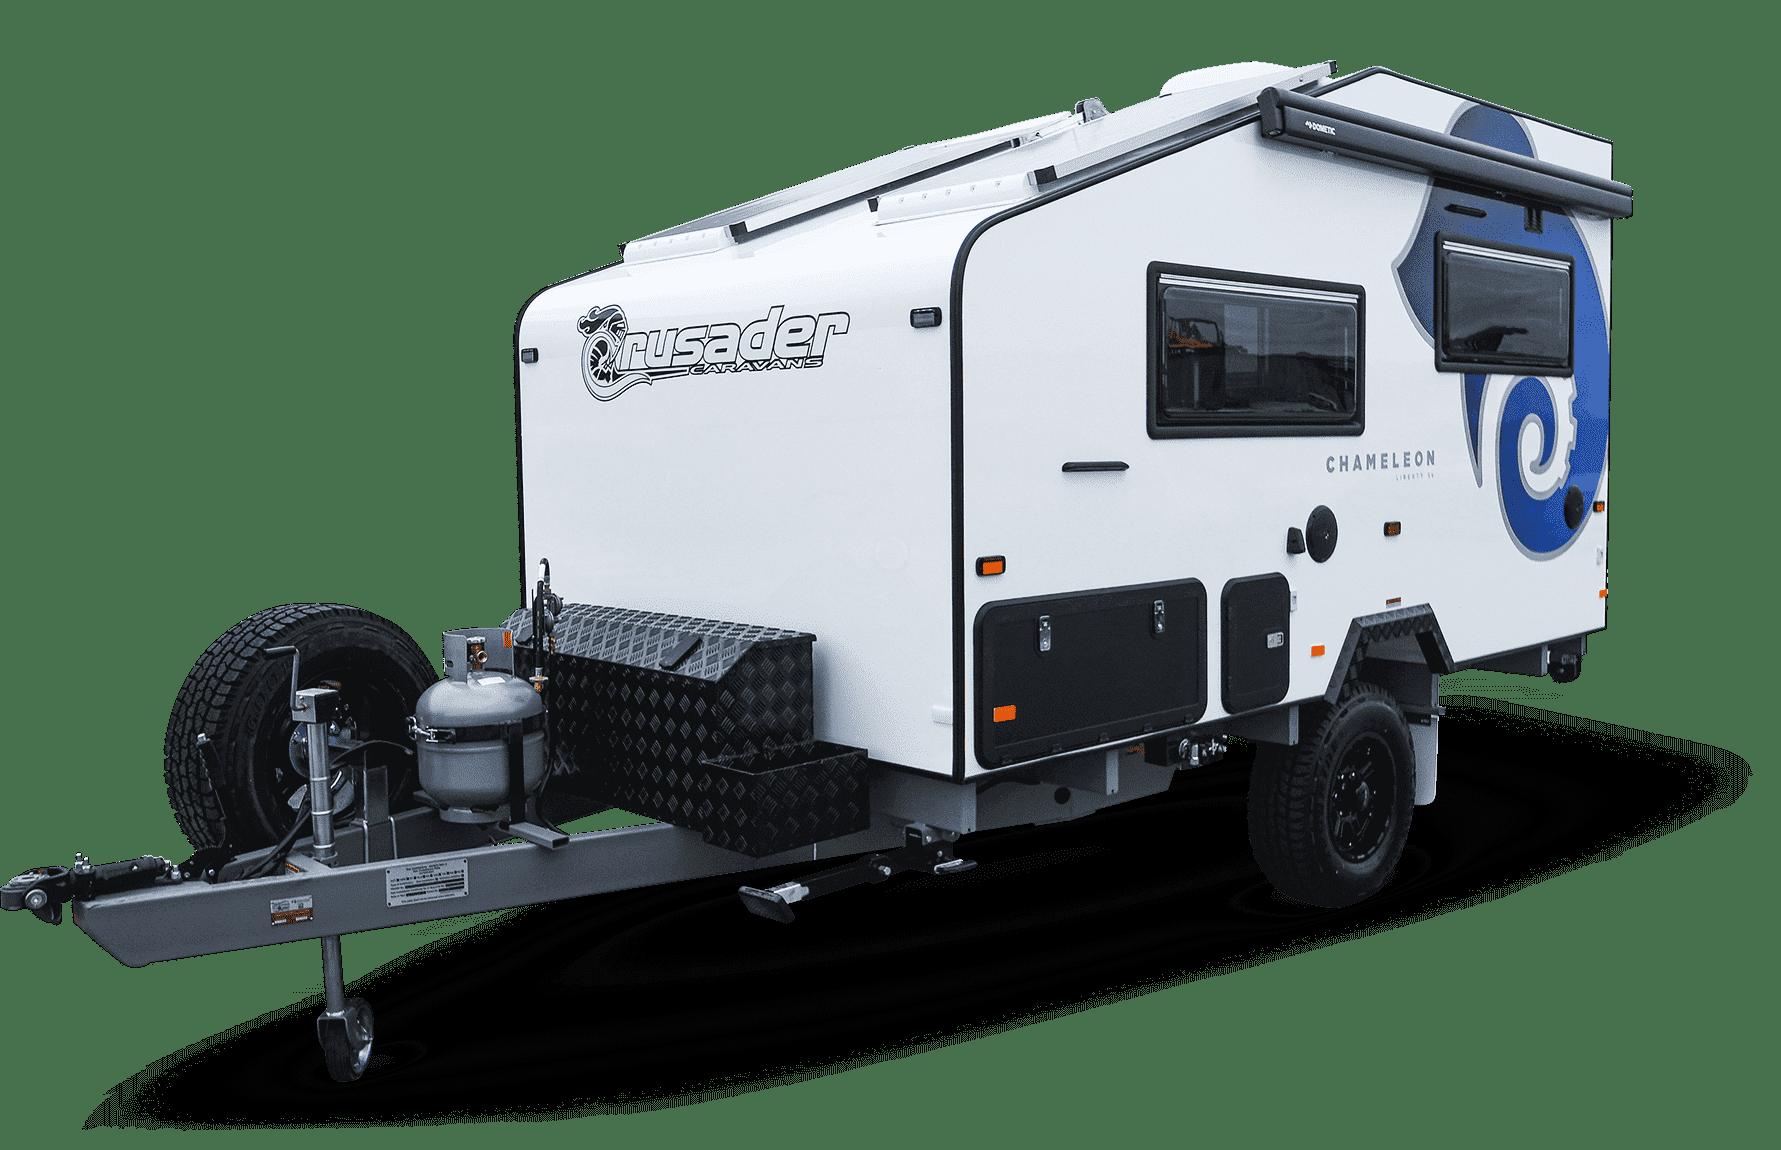 Image the Chameleon Liberty new caravan for sale.